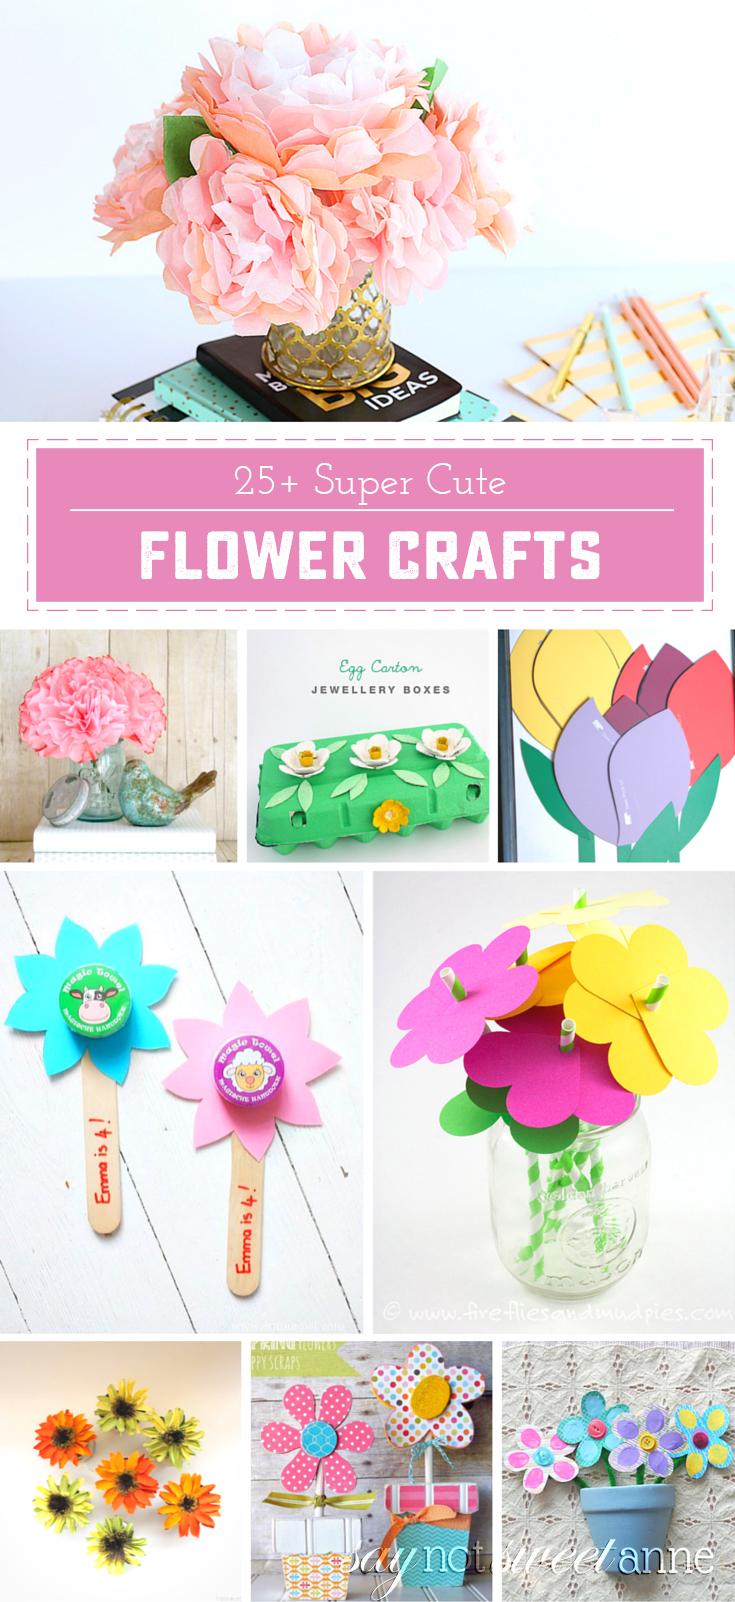 25 Flower Crafts via saynotsweetanne.com!!